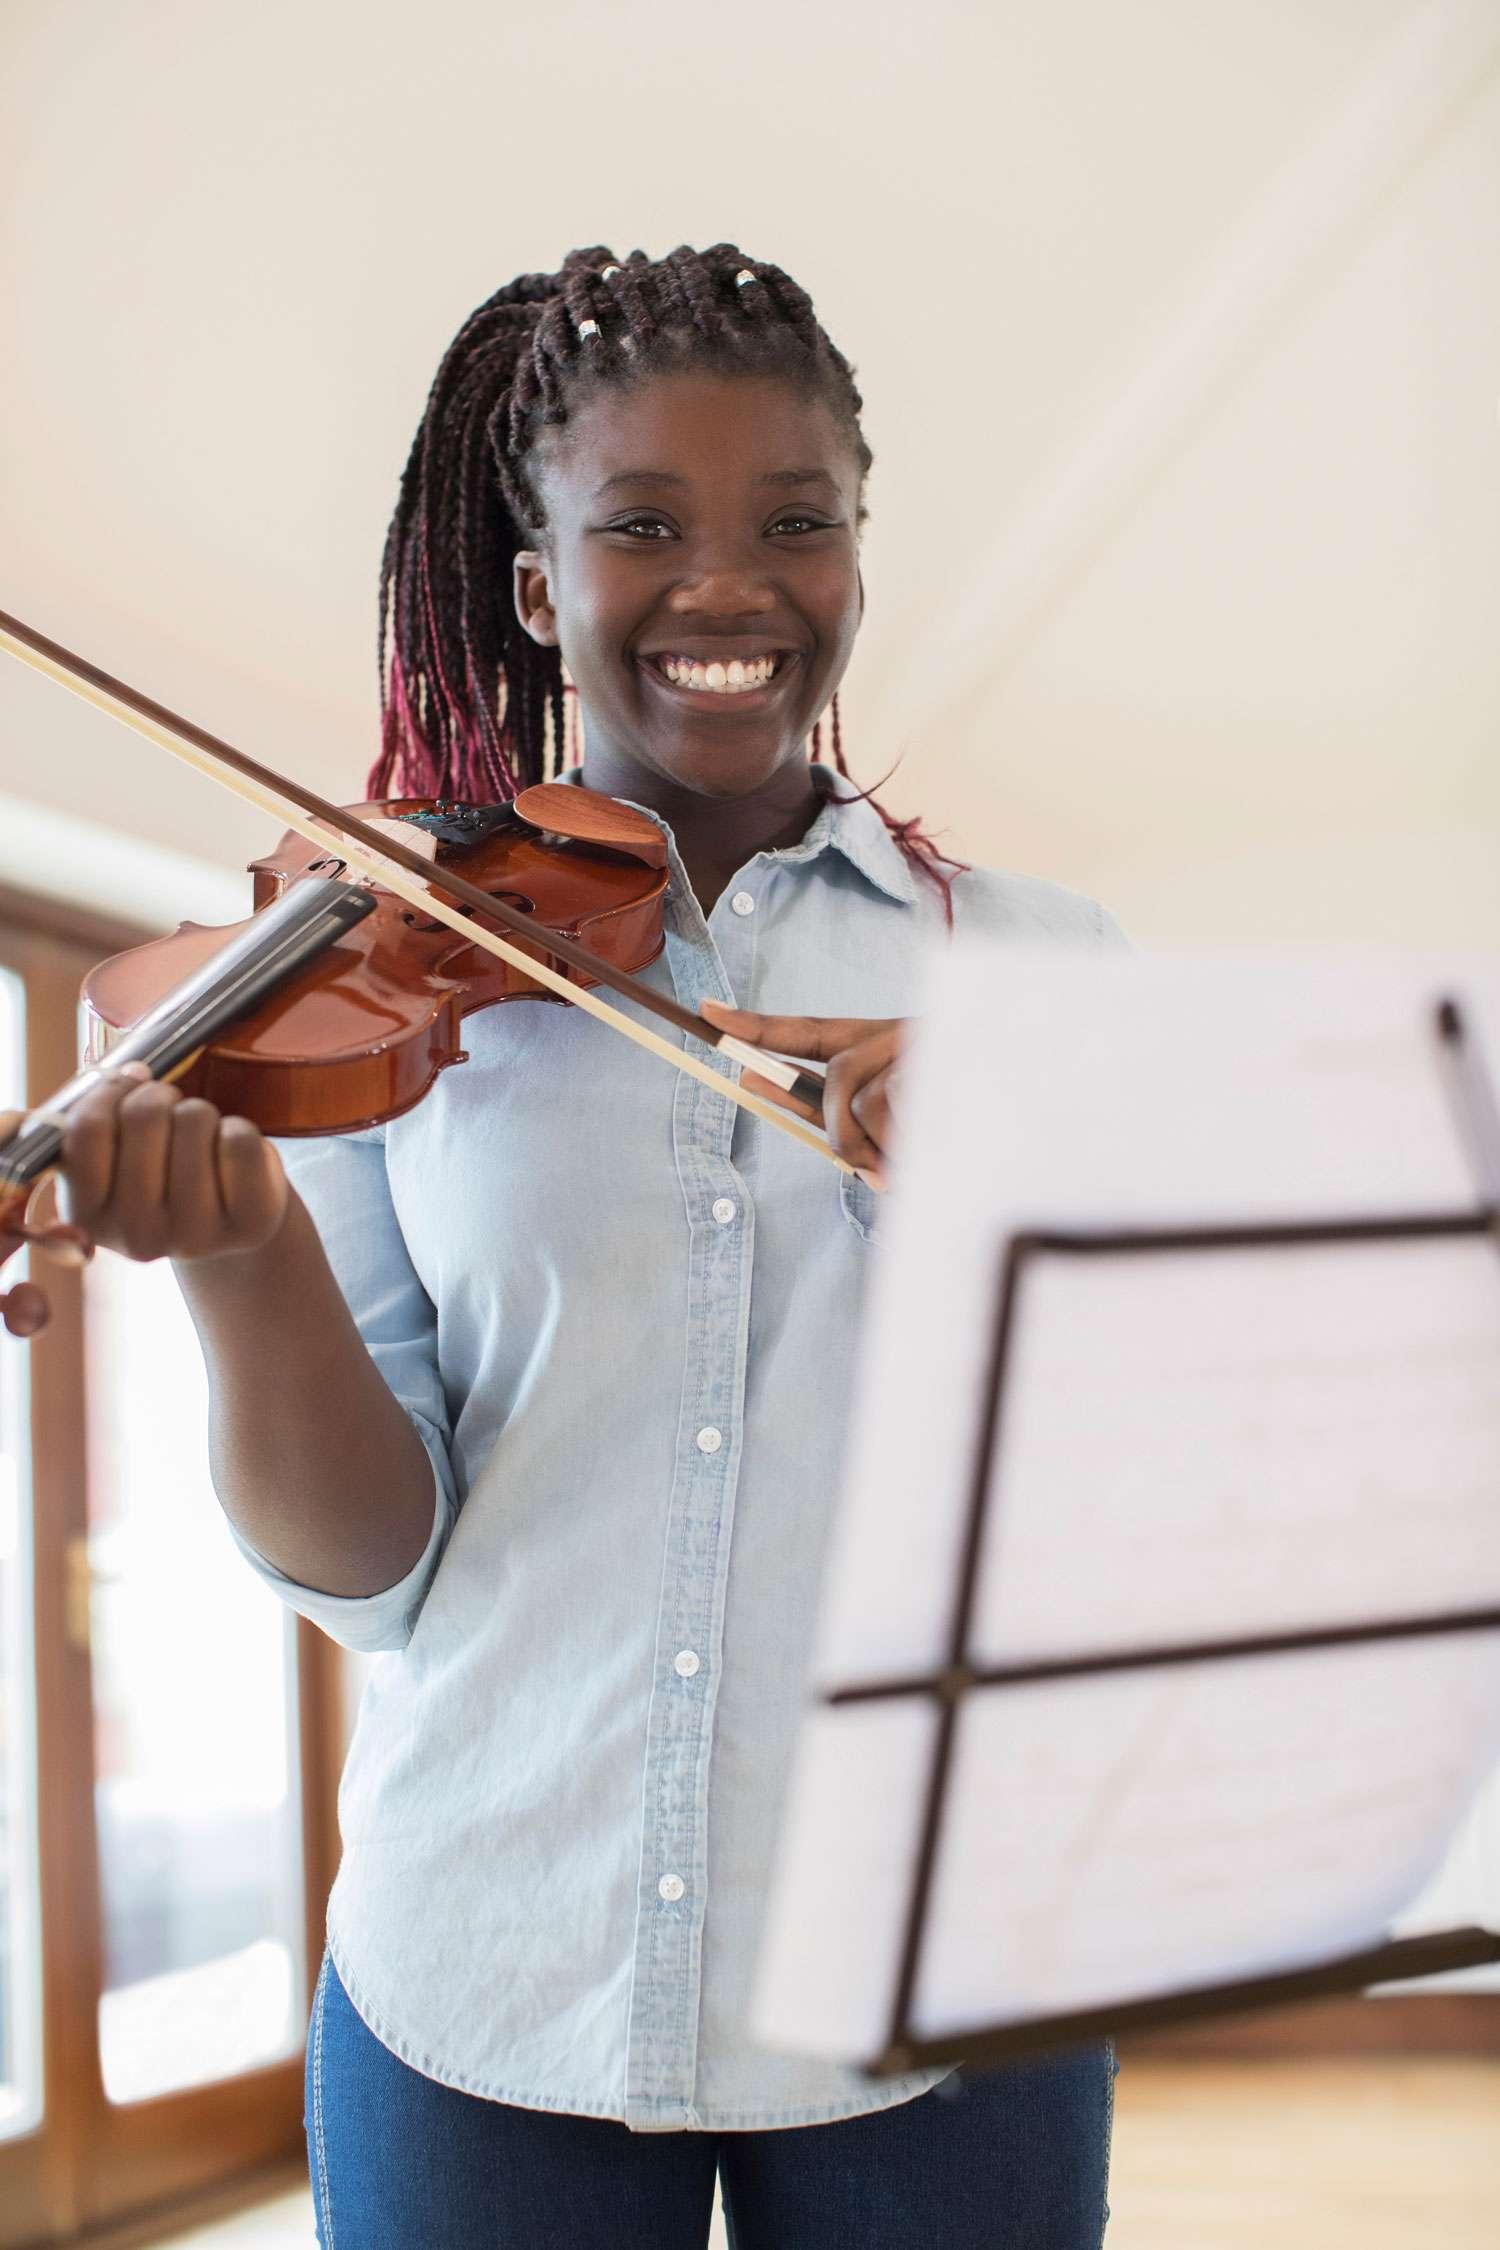 young violin student smiling at the camera